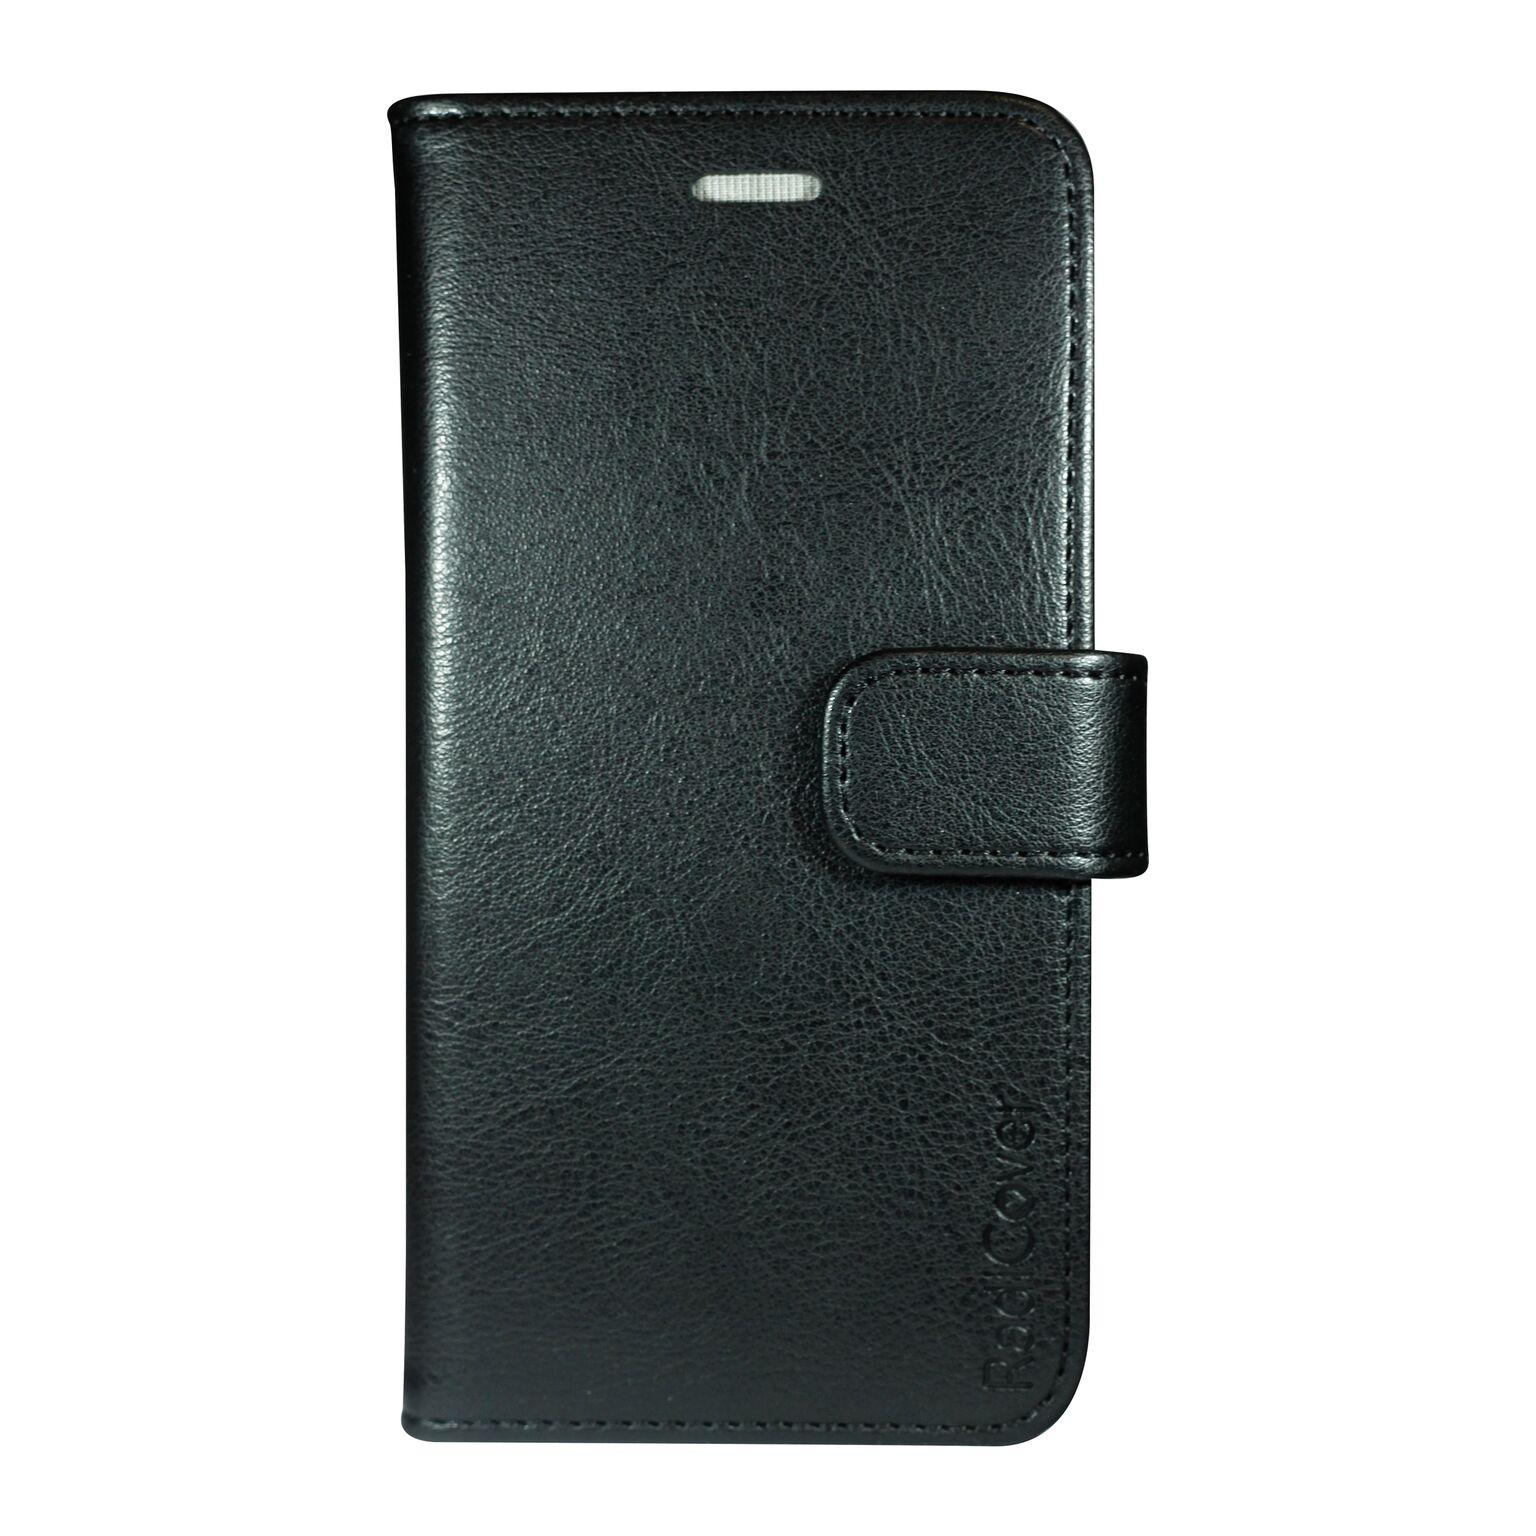 "RadiCover - Flipside ""Fashion"" Stand Function - iPhone 6/7/8/SE - Black"